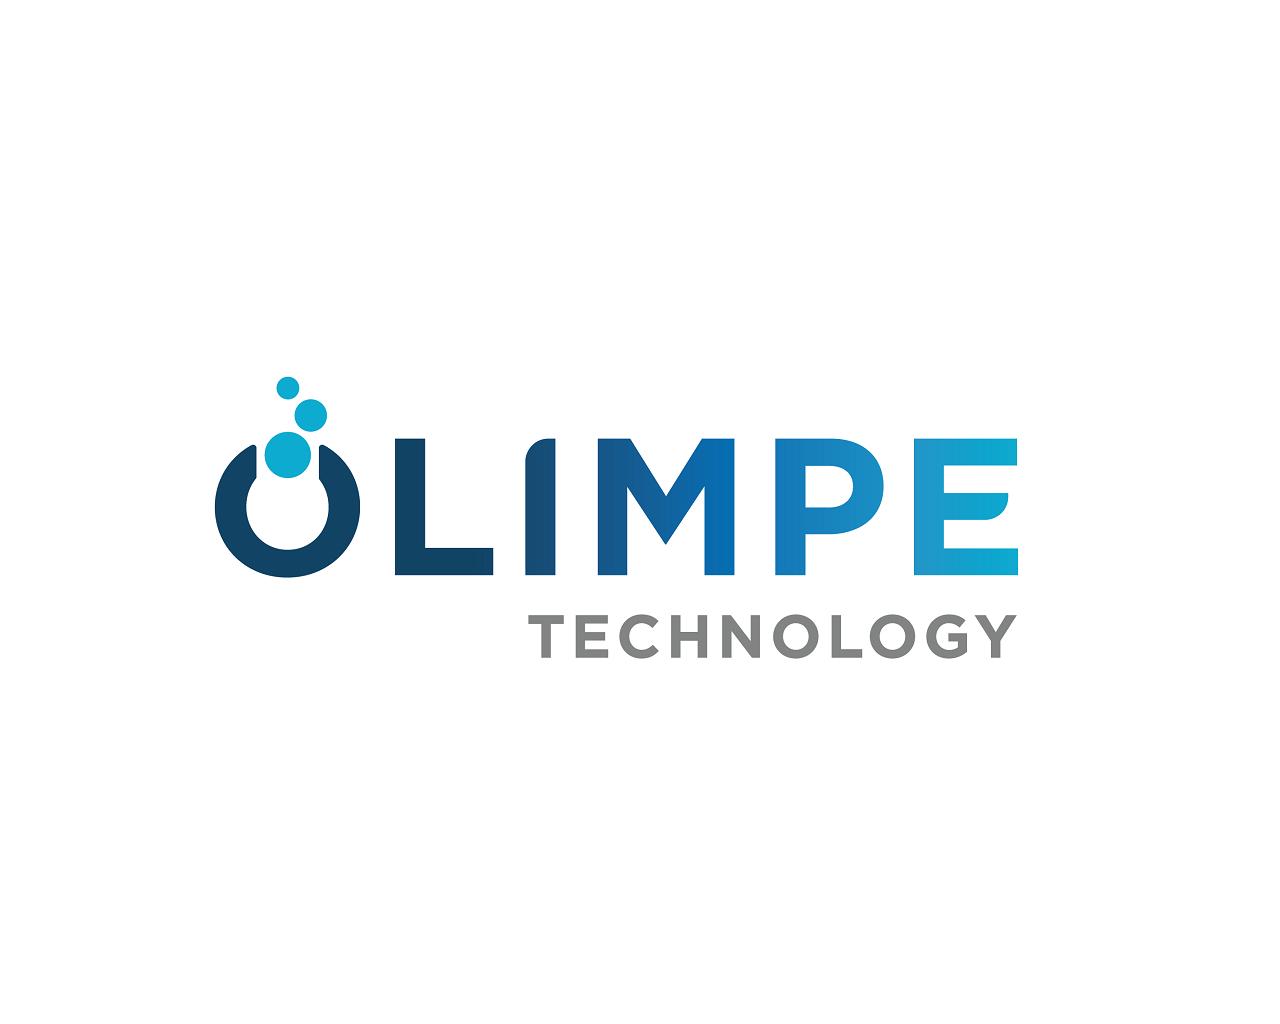 https://synergence.fr/wp-content/uploads/2021/04/Logo-Olimpe-Technolgy.png